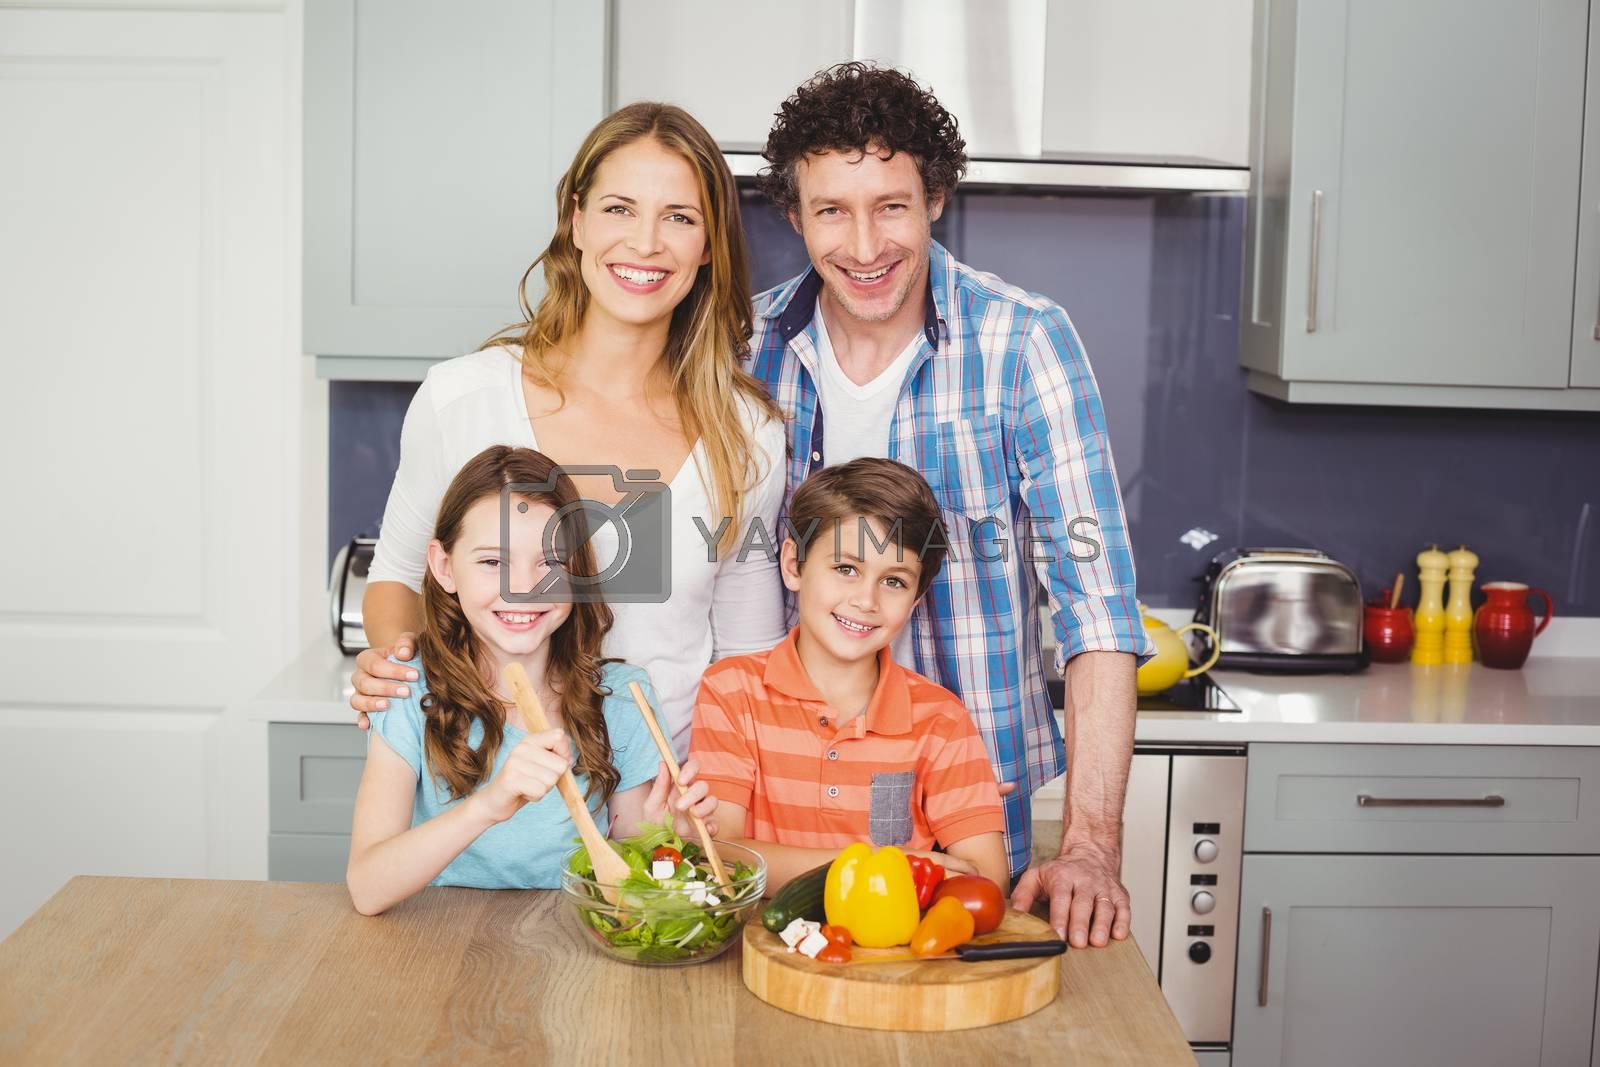 Portrait of smiling family preparing vegetable salad in kitchen